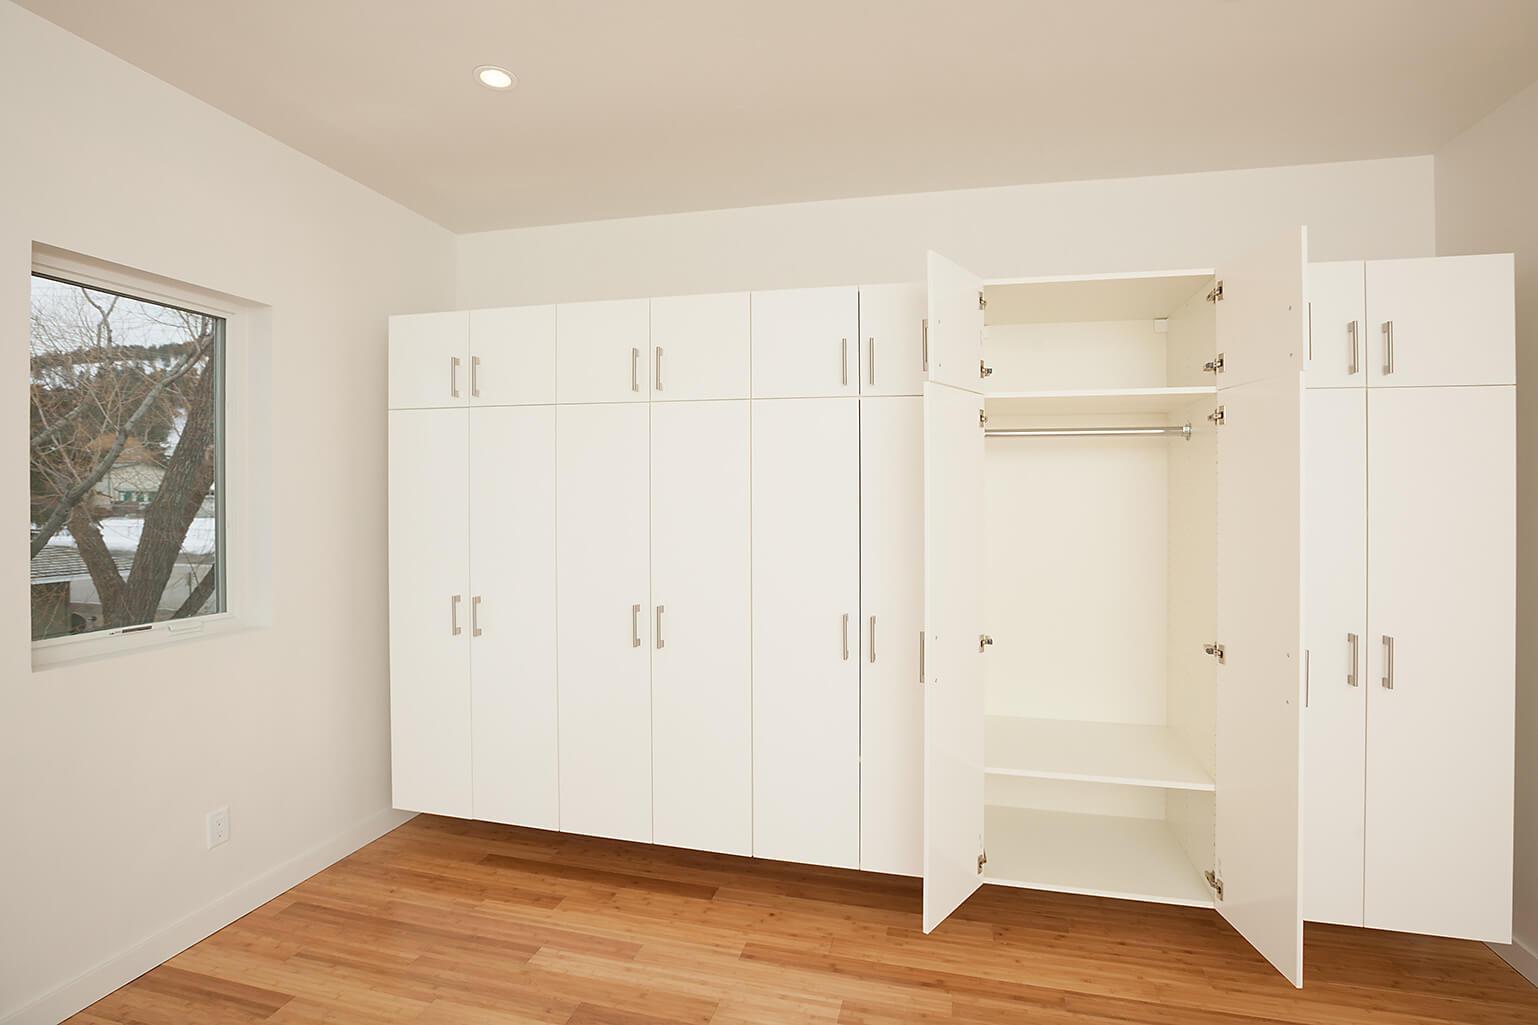 010-Closet Units.jpg